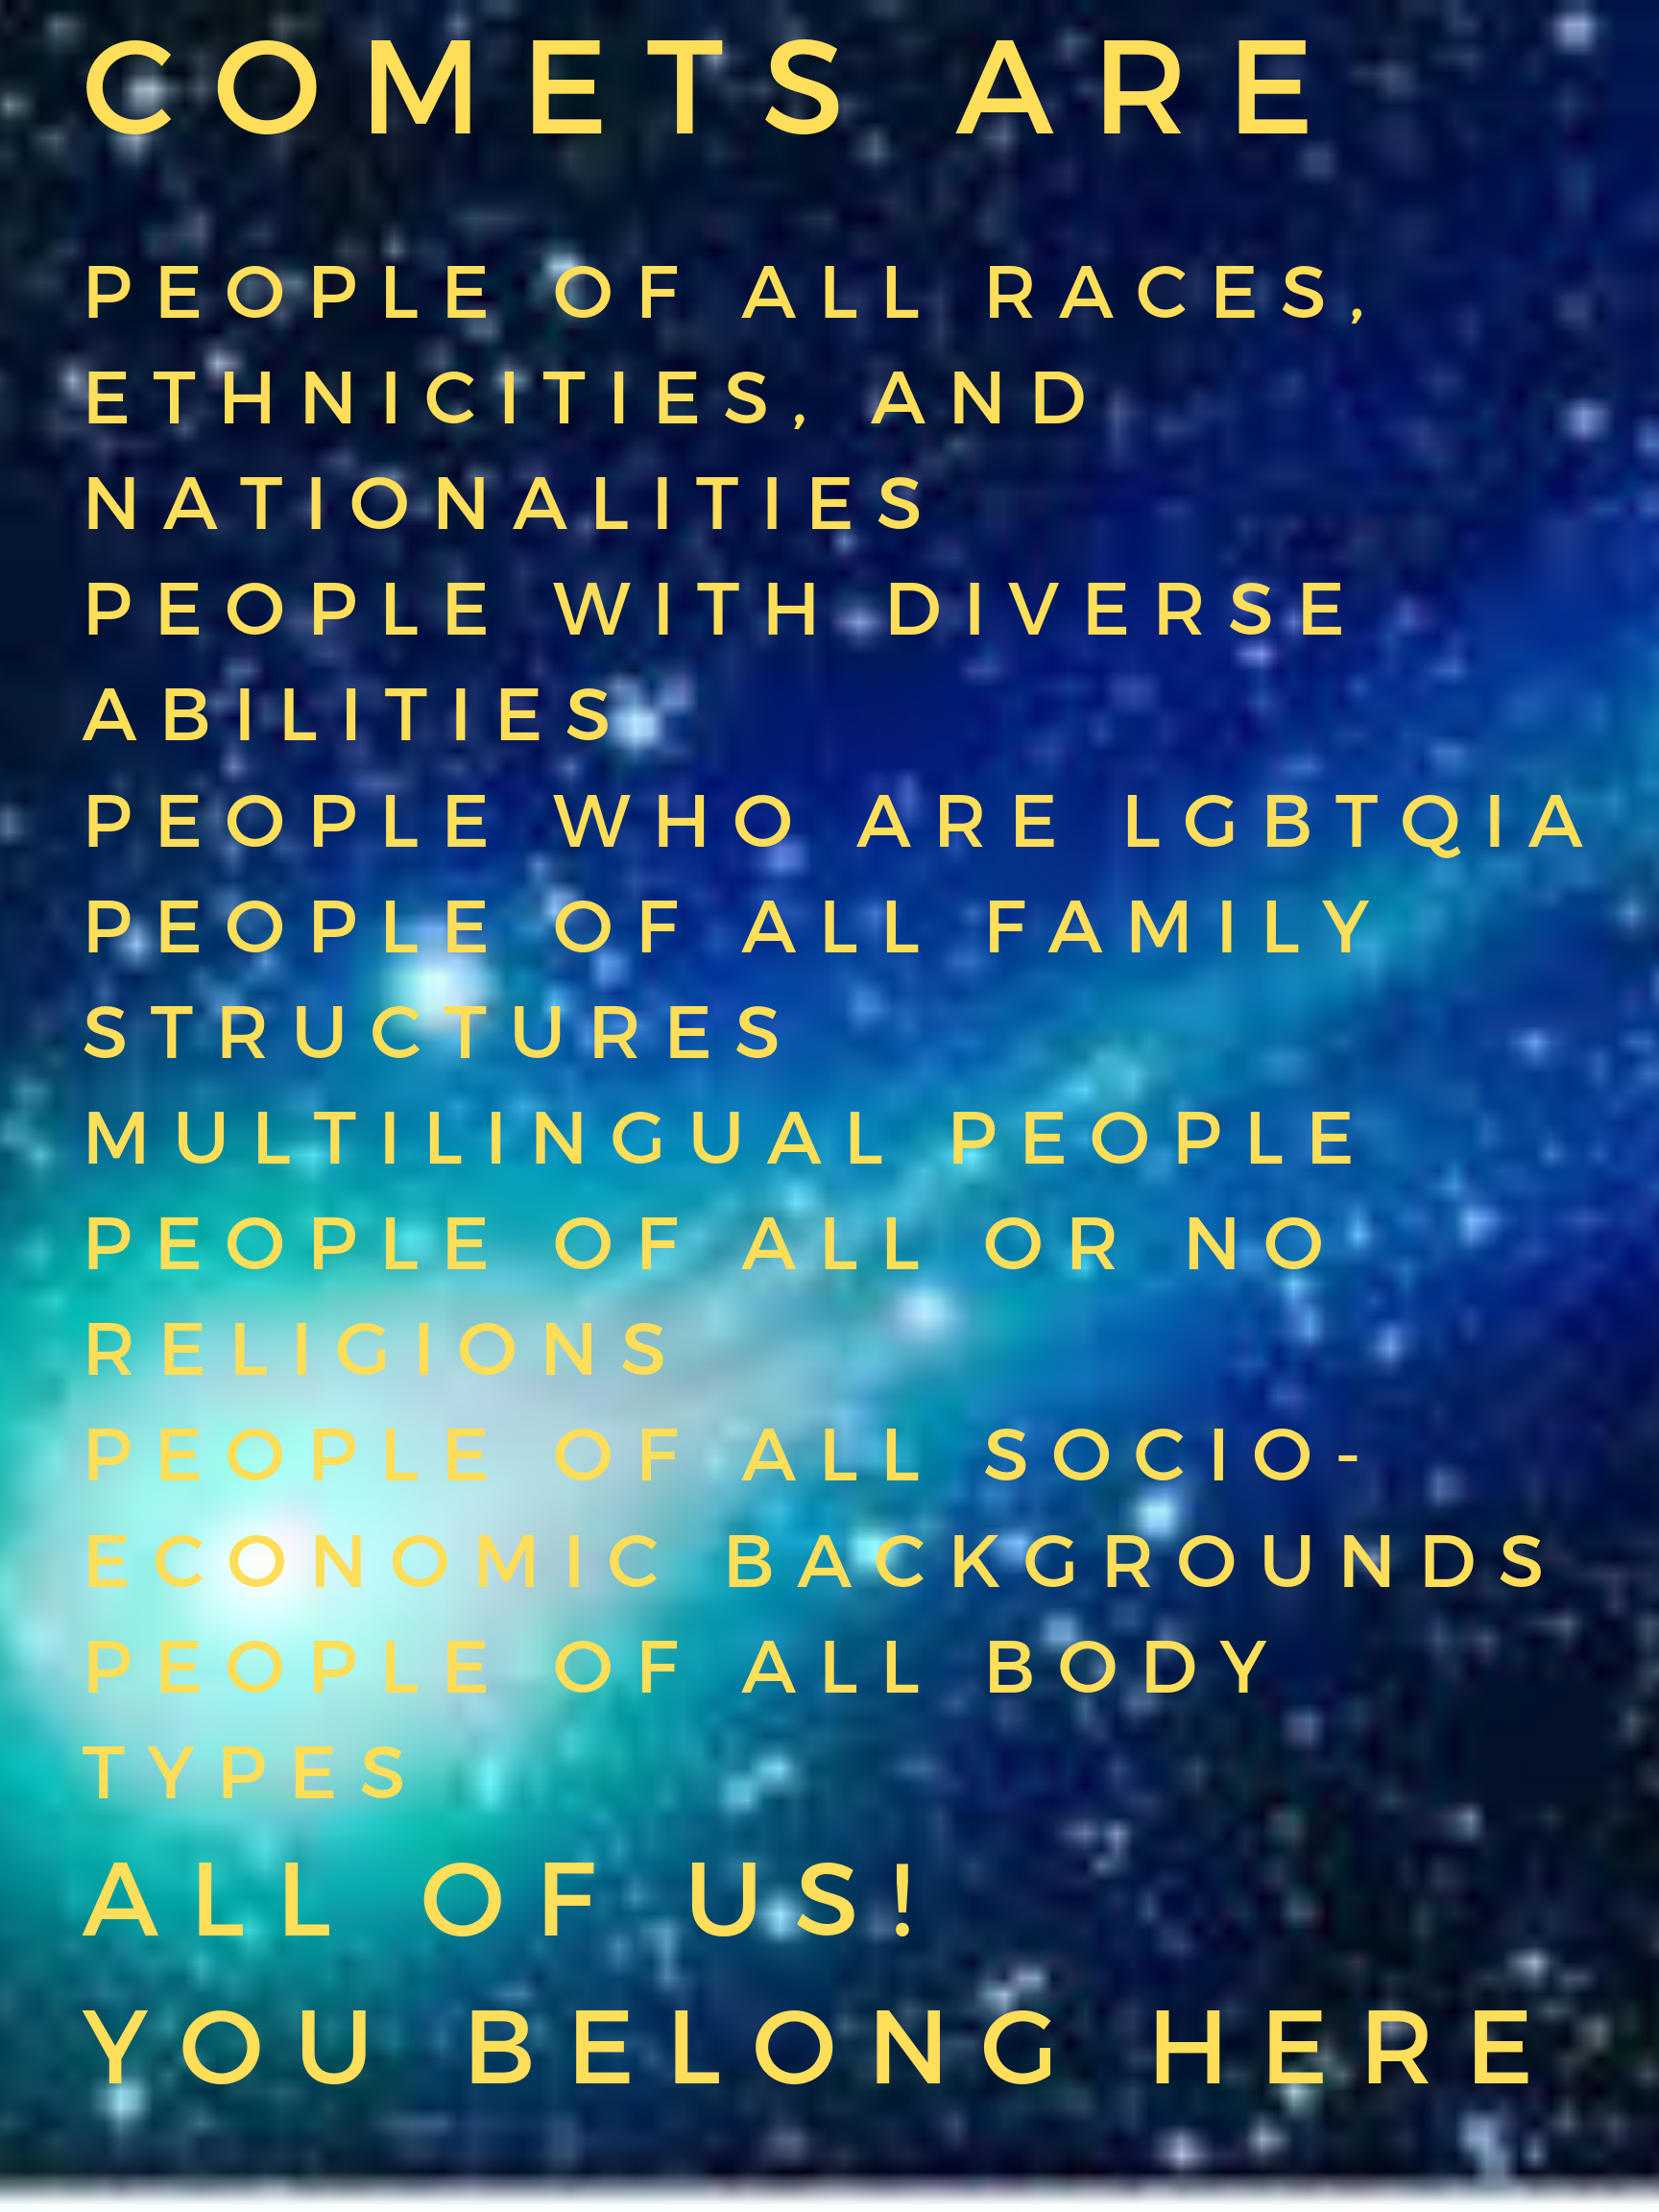 McKinleyville Middle School Manifesto